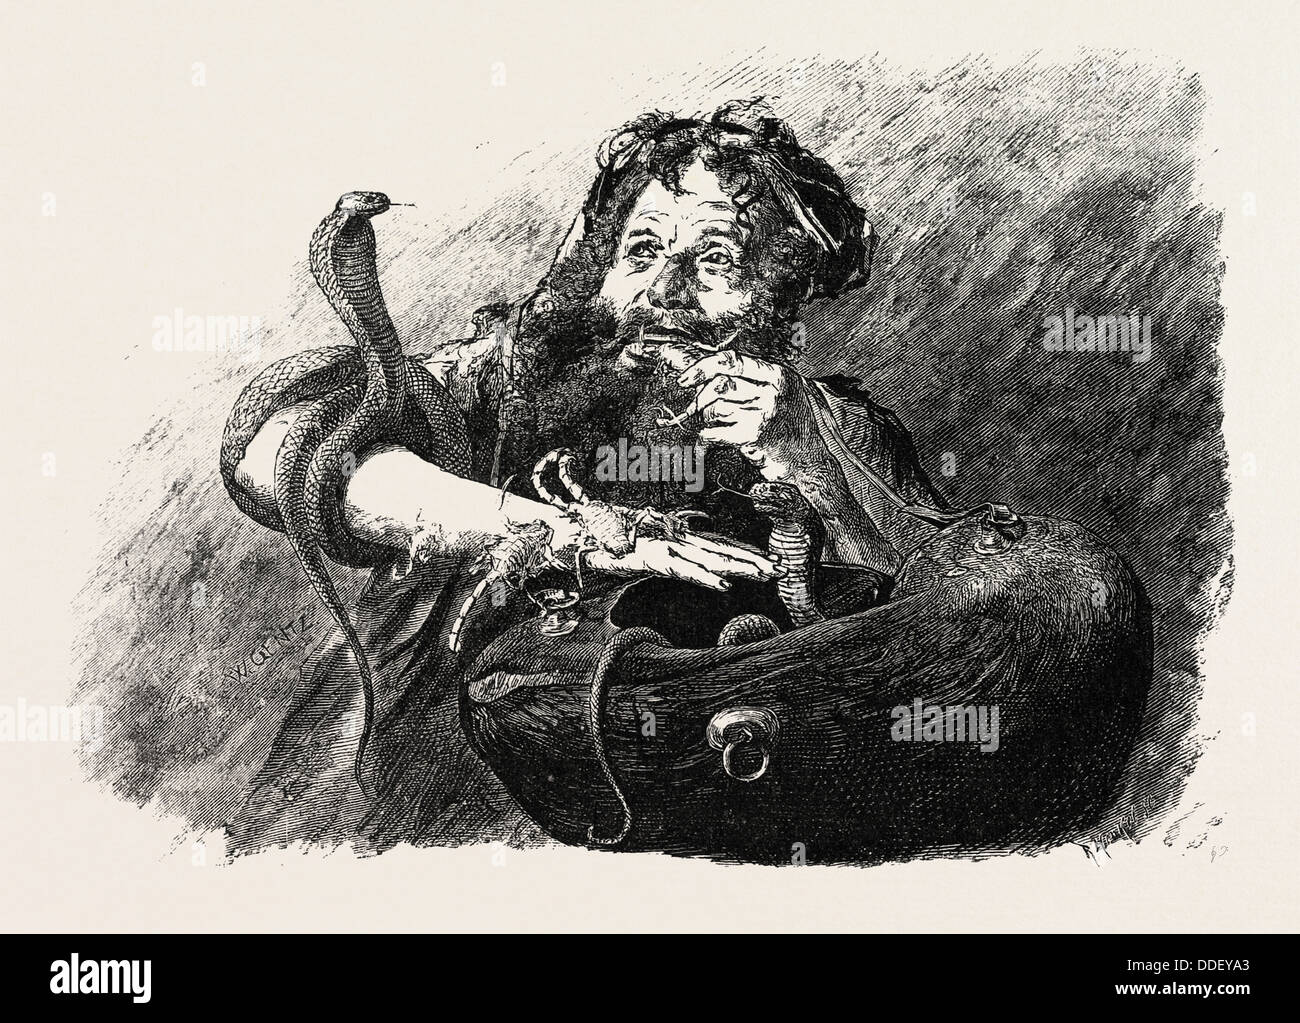 DERVISH EATING SCORPIONS.  Egypt, engraving 1879 - Stock Image